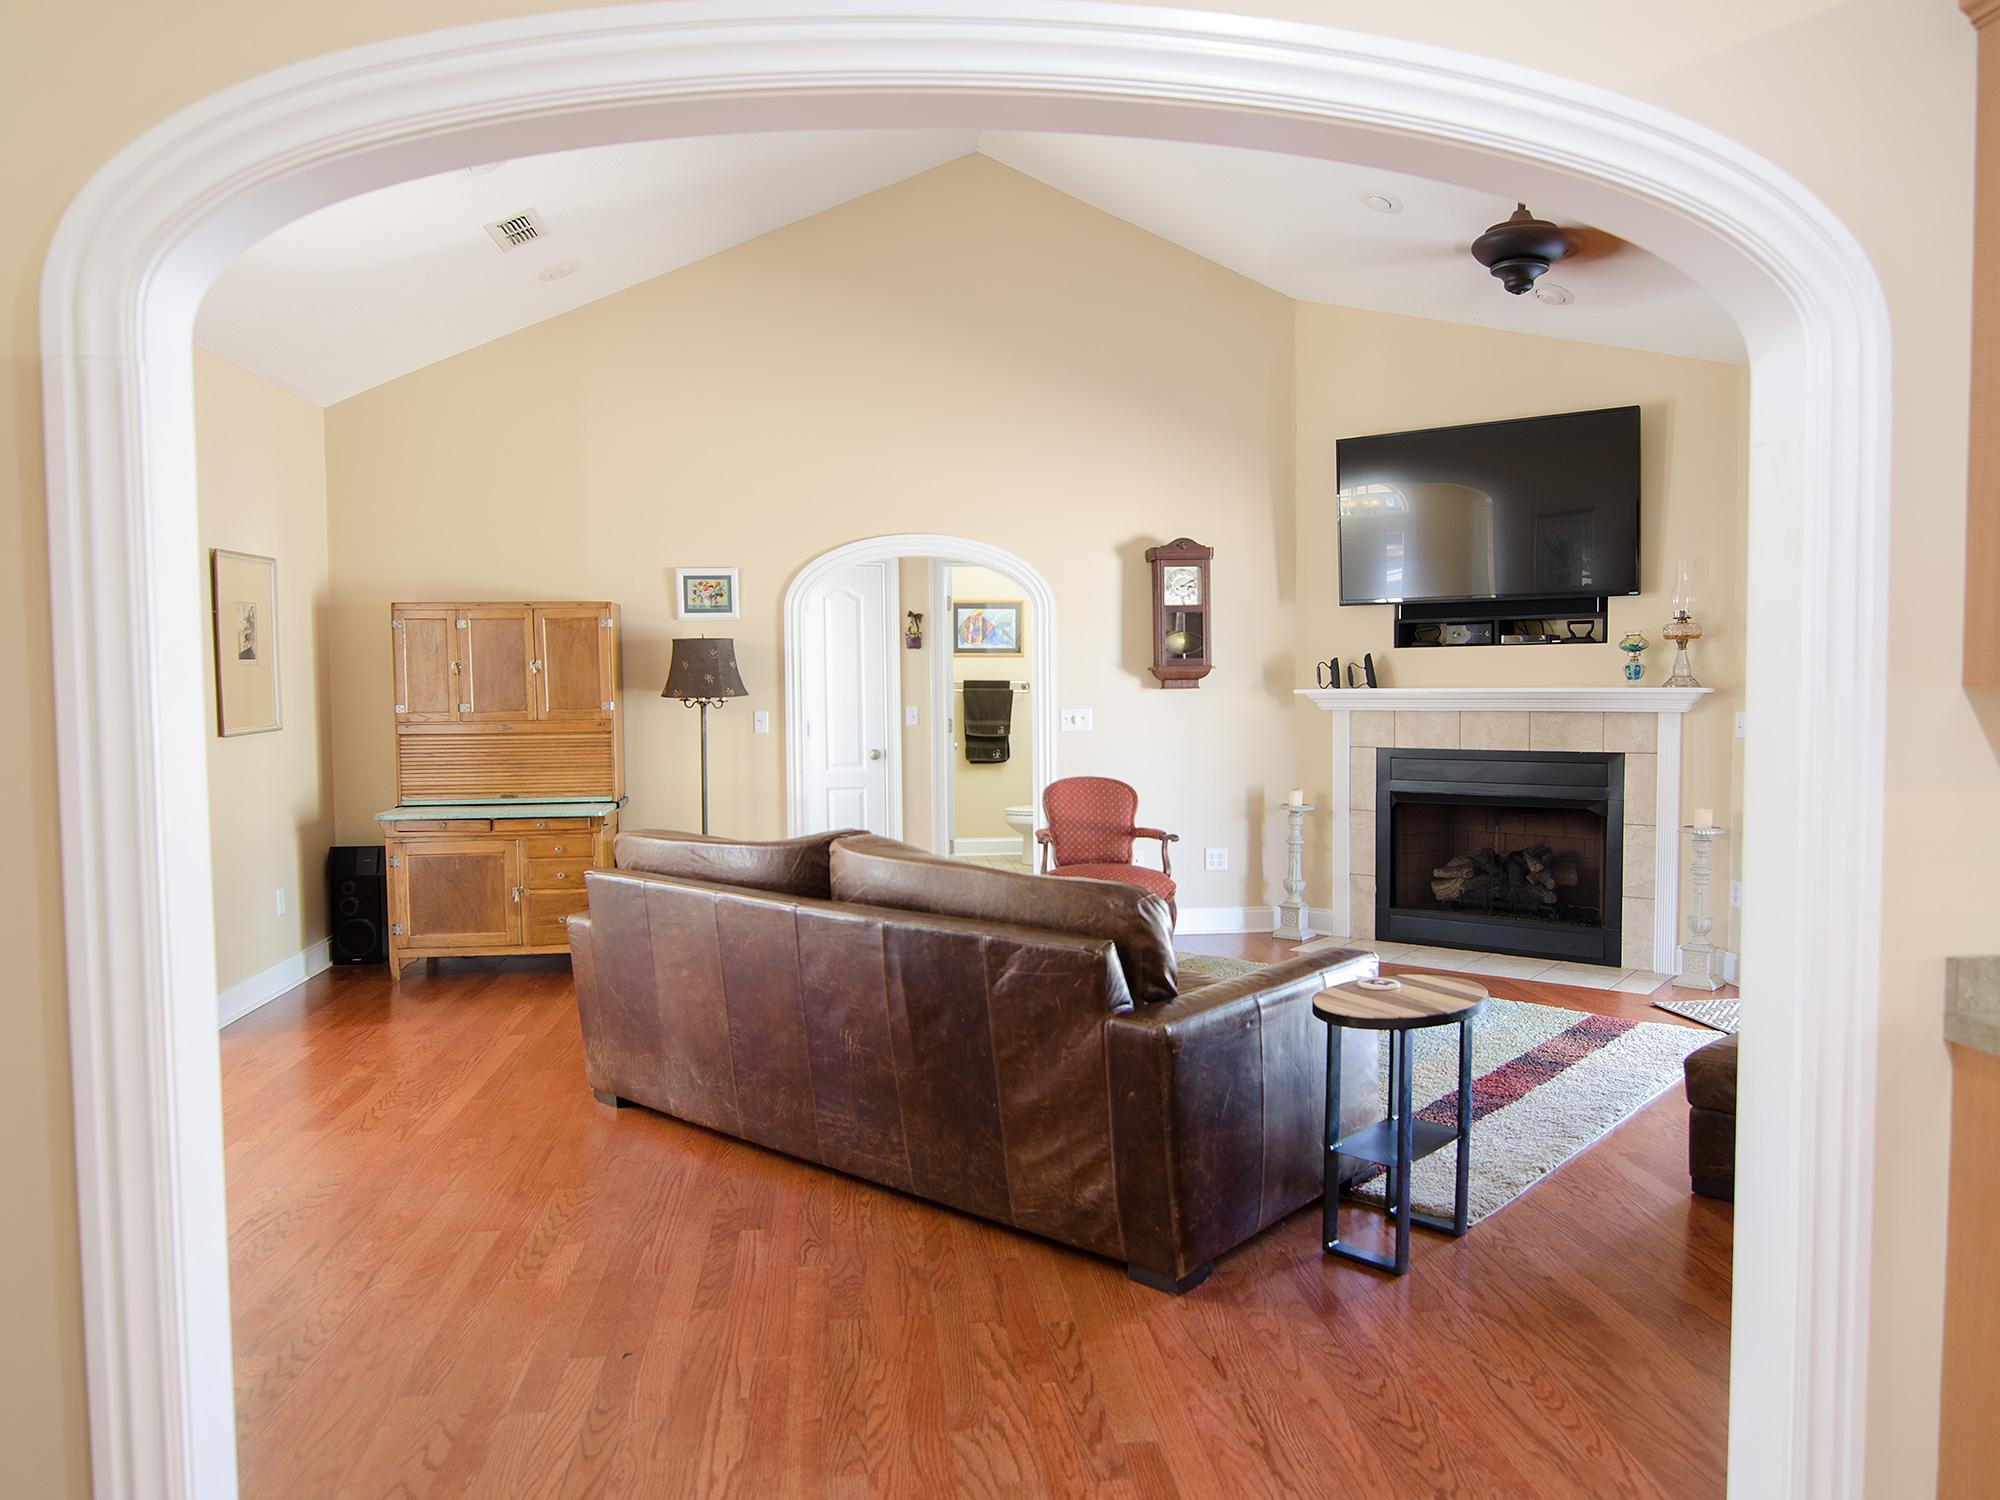 3riversrealty,-bainbridge-home-for-sale,boxwood-drive,mills-brock,randee-eubanks,livingroom2.jpg